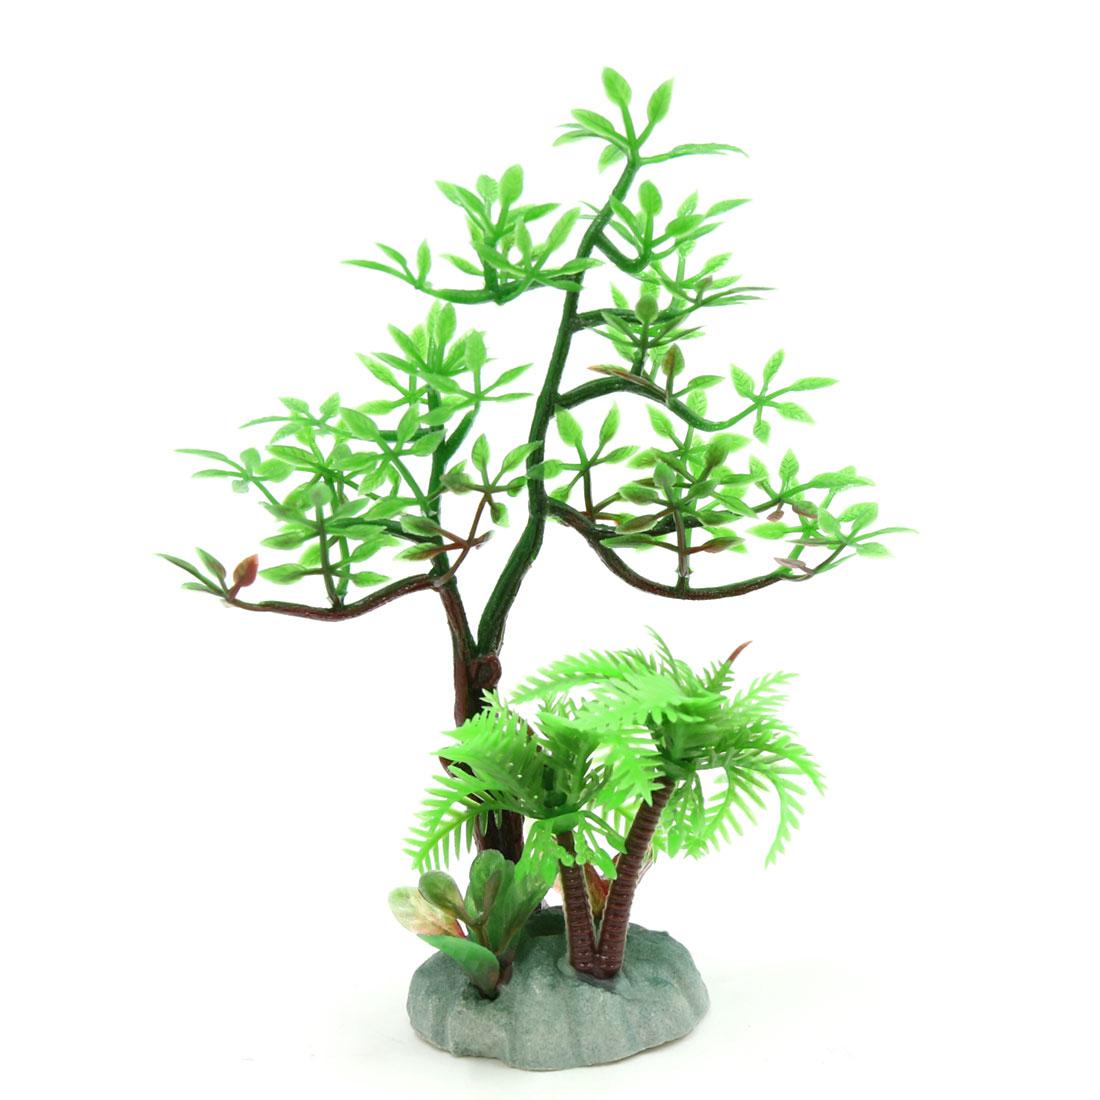 Plastic Plant Aquarium Landscape Decoration Ornament for Small Tanks